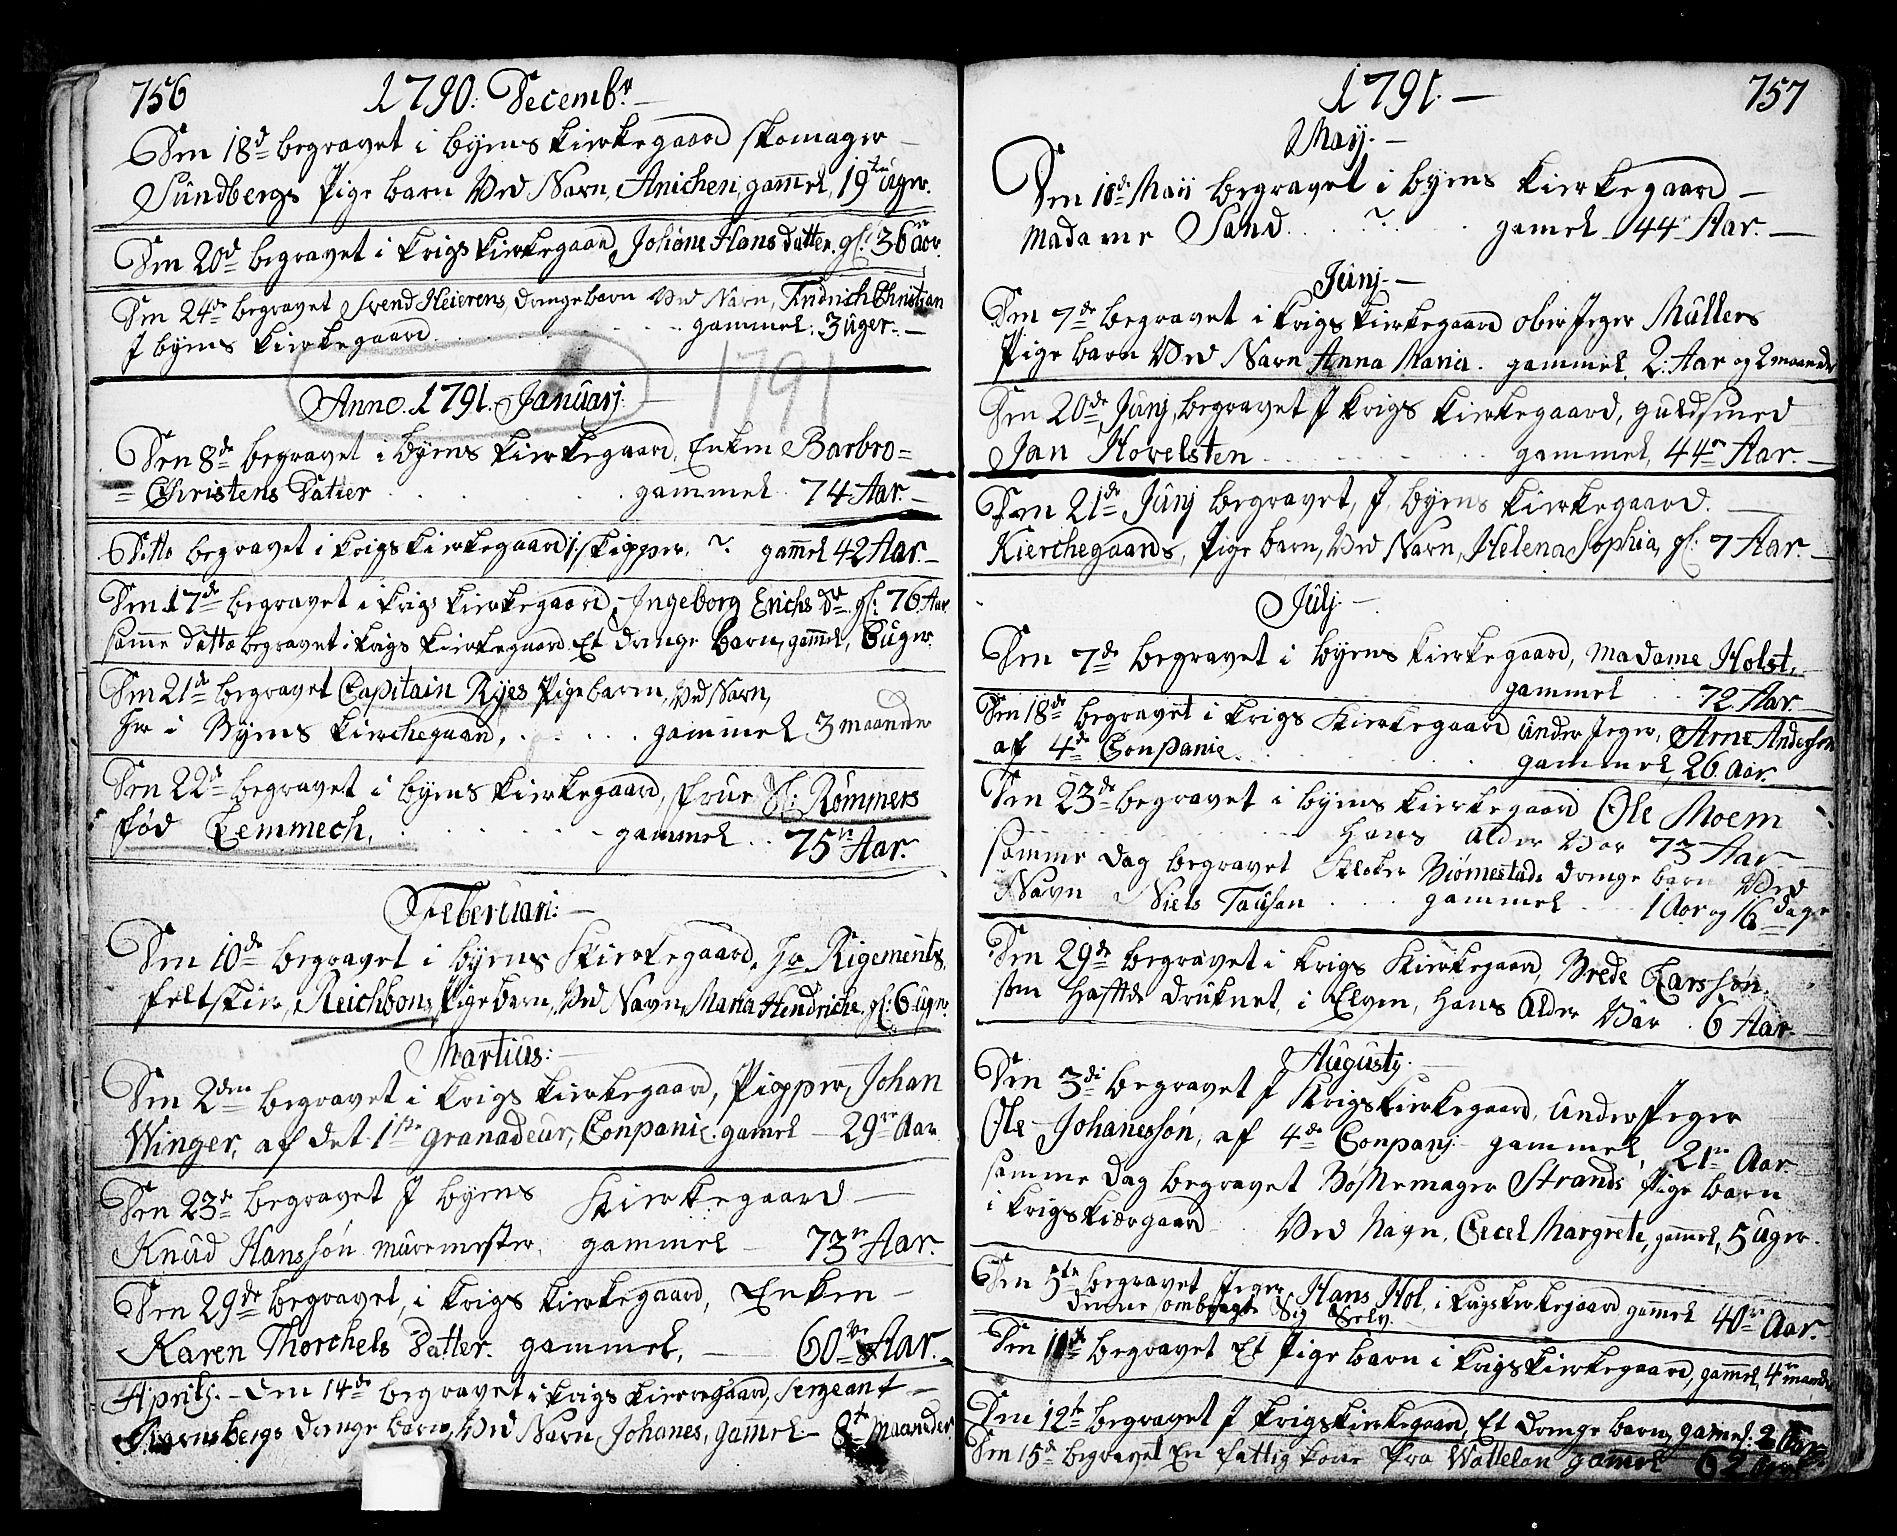 SAO, Fredrikstad prestekontor Kirkebøker, F/Fa/L0002: Ministerialbok nr. 2, 1750-1804, s. 756-757